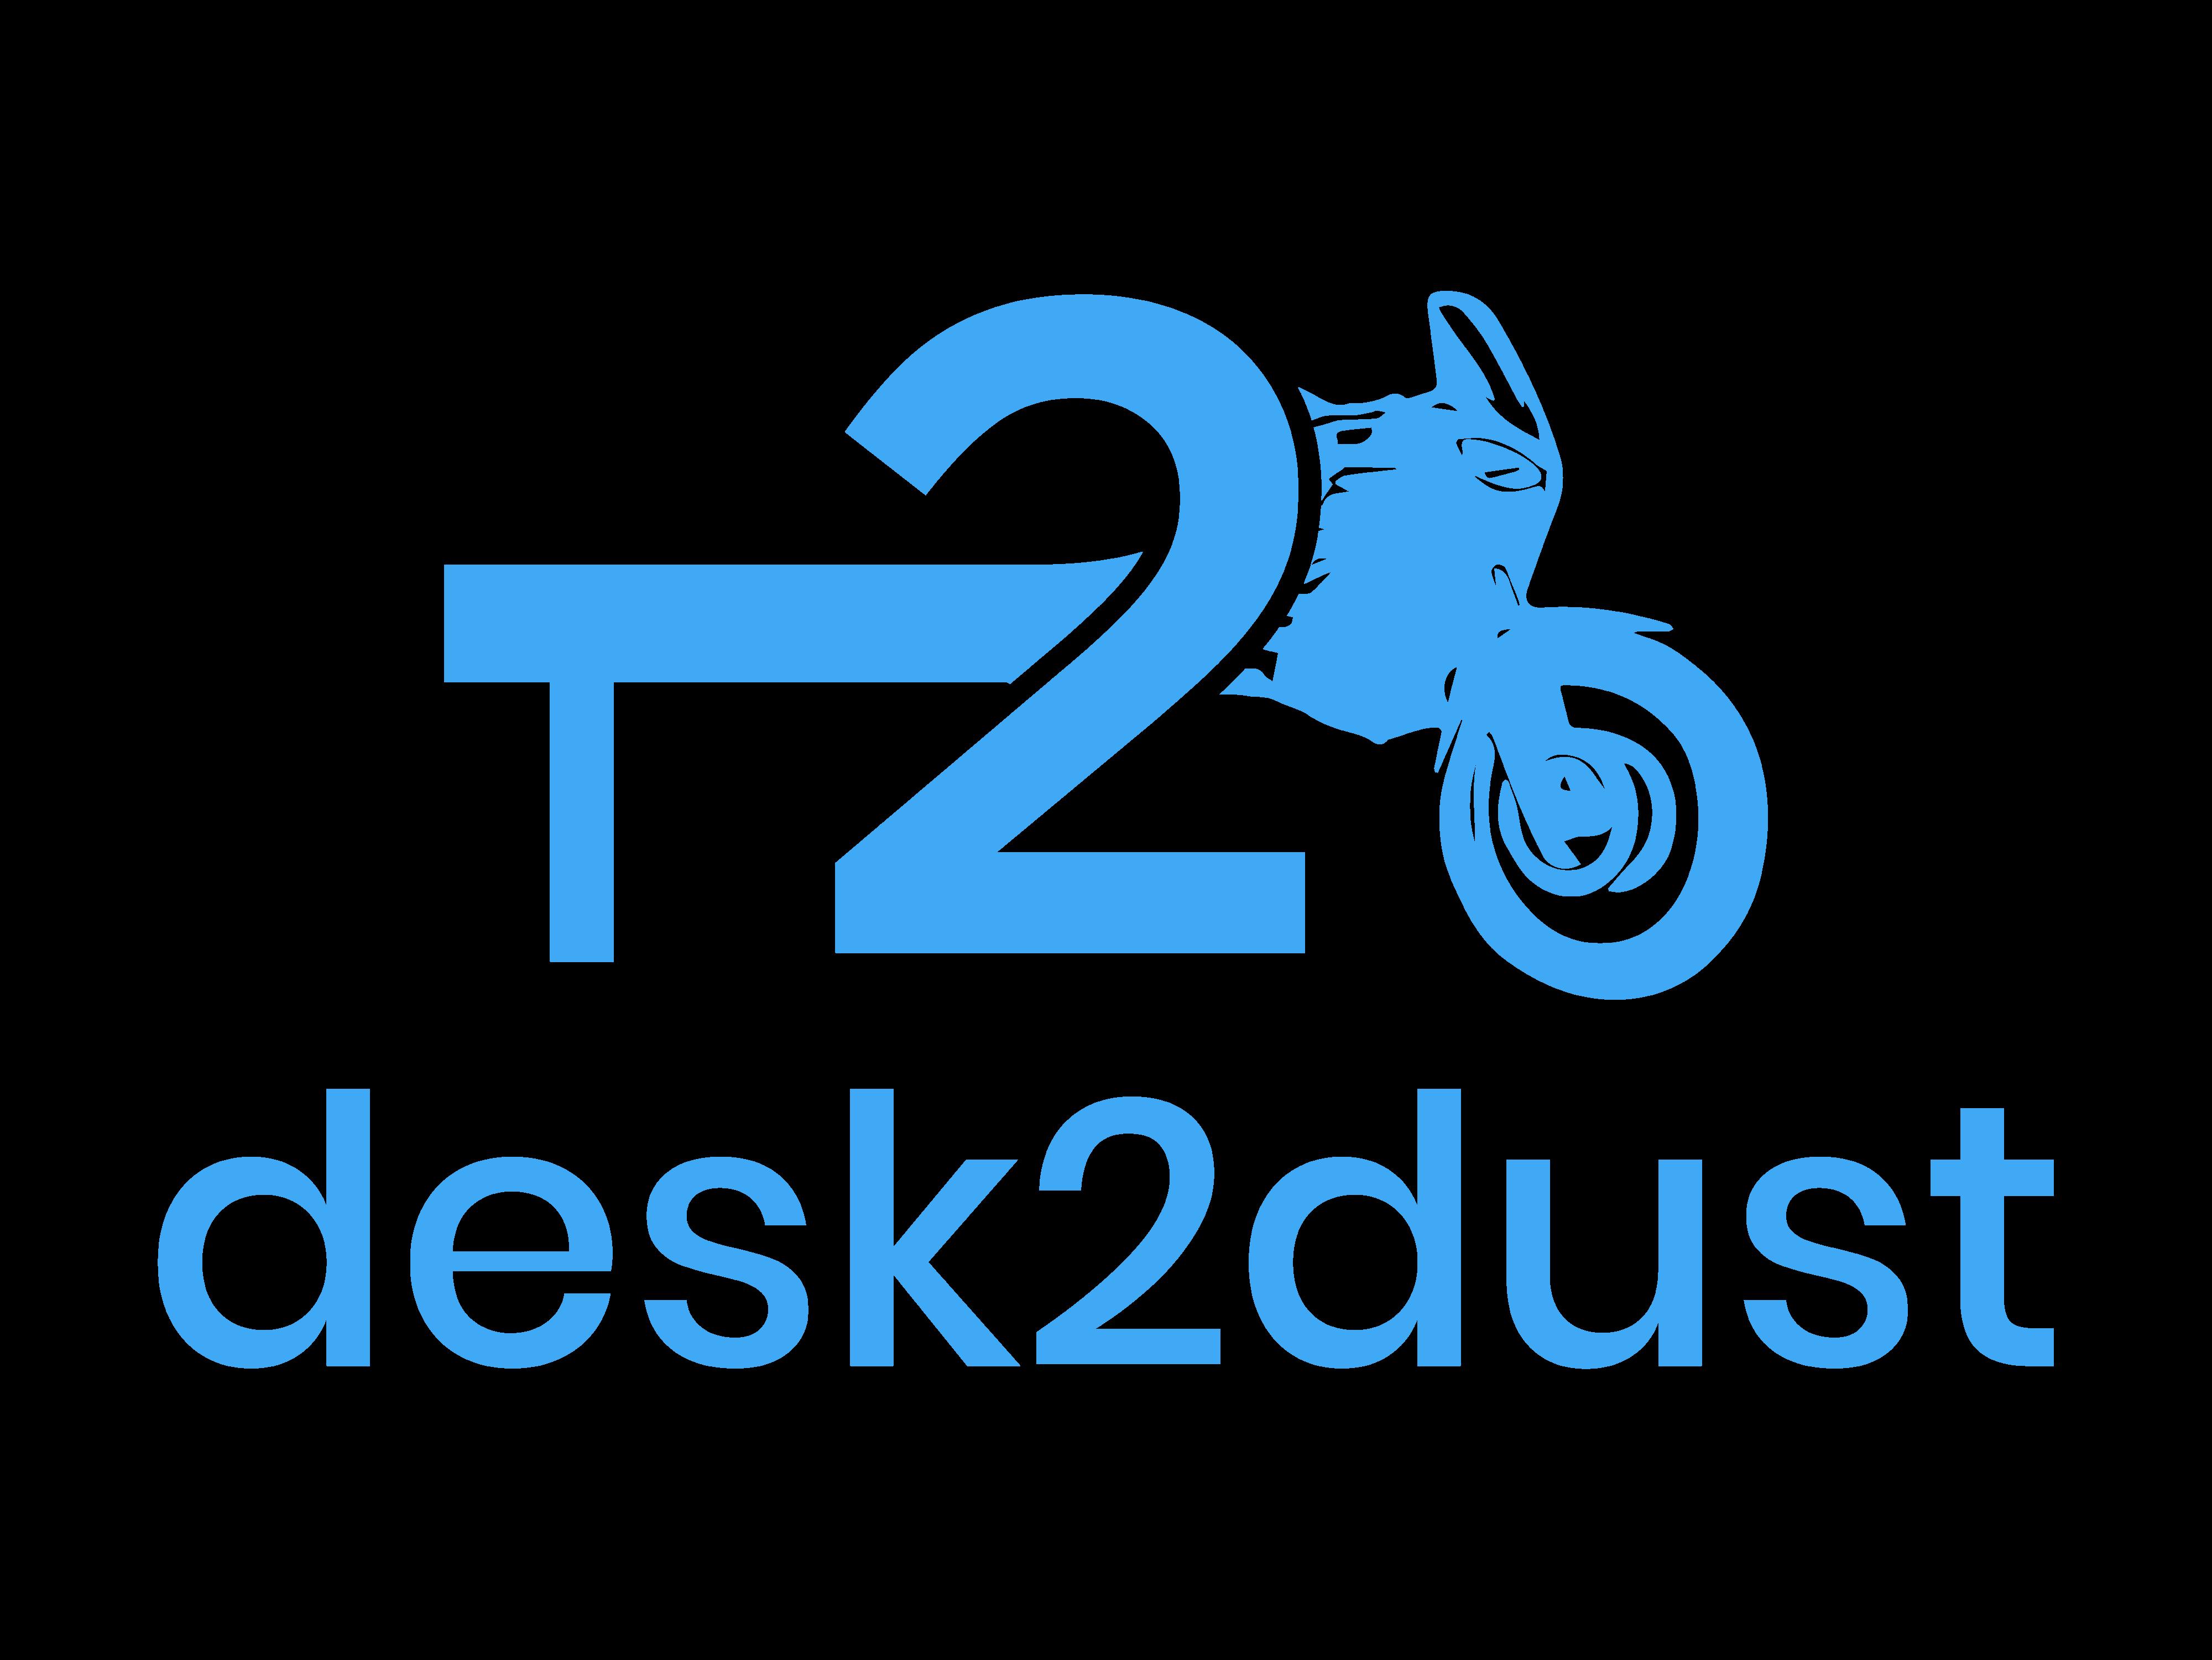 desk2dust